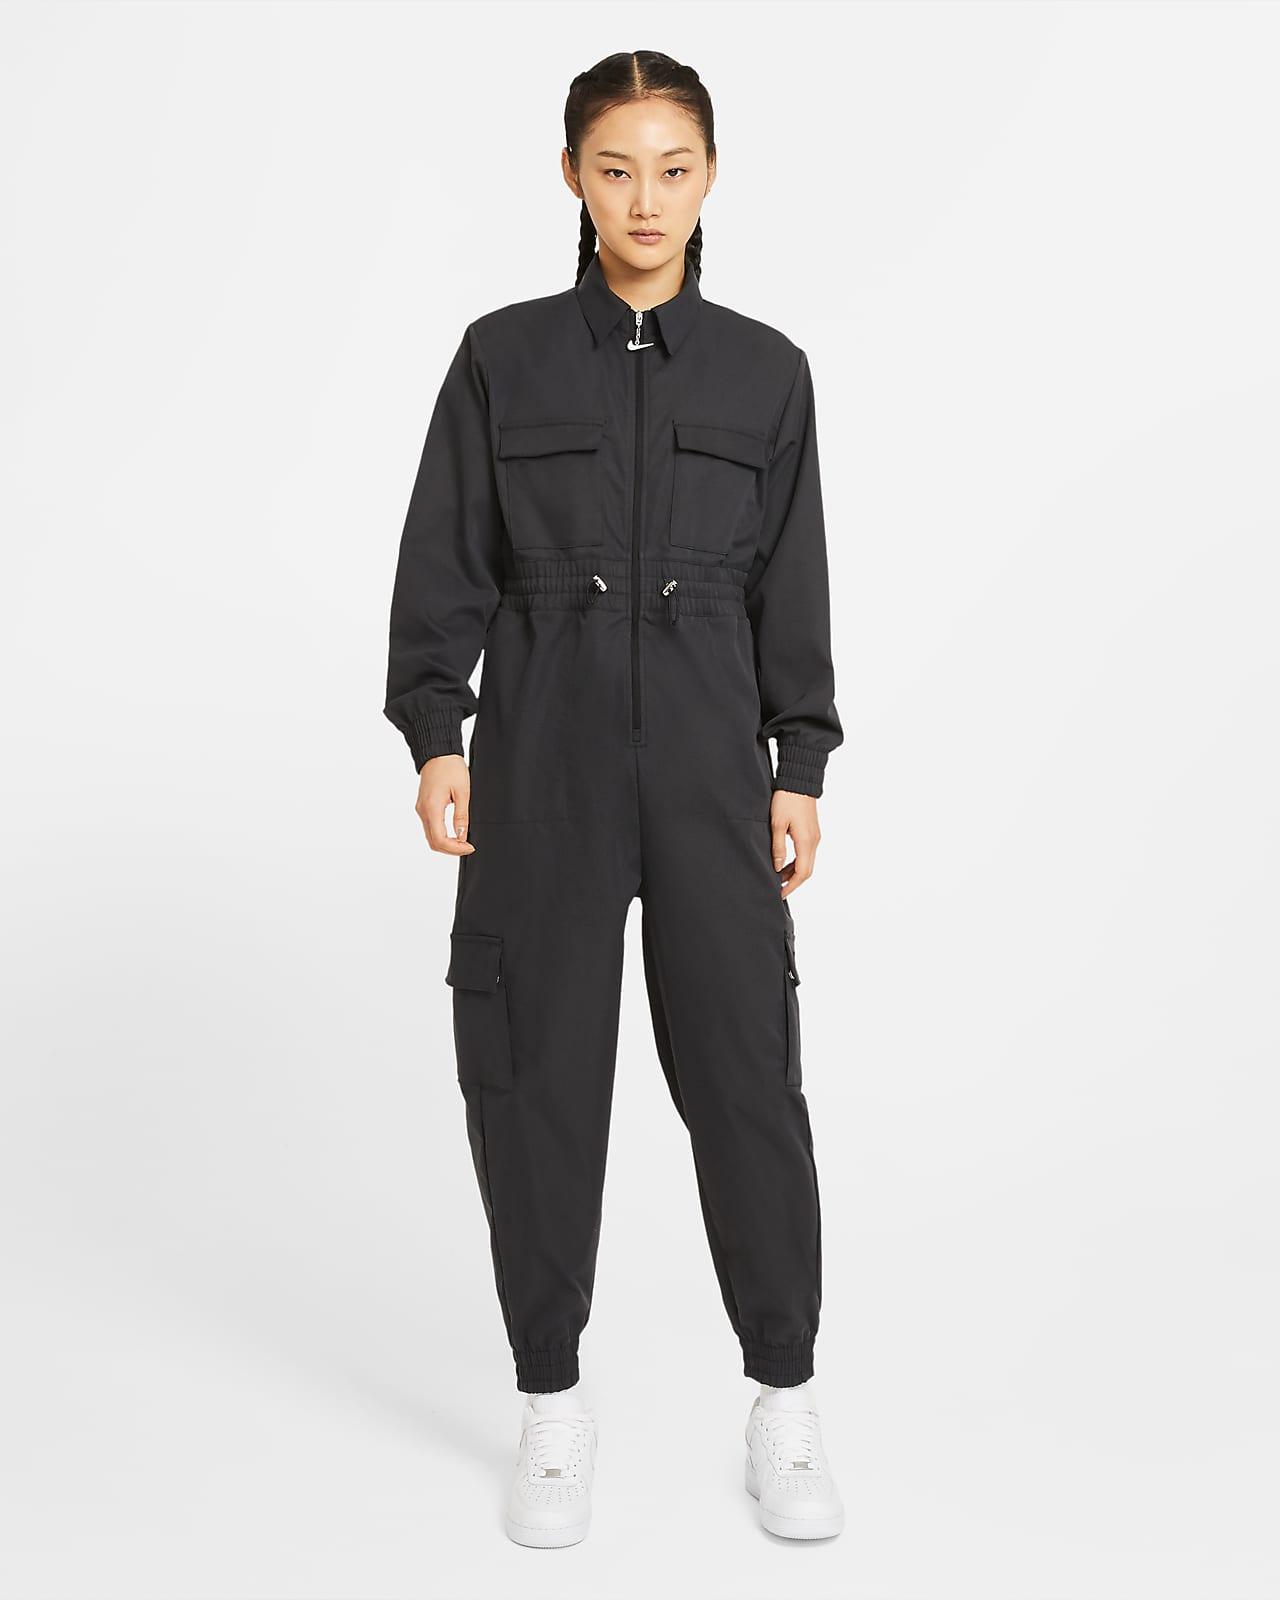 Nike Sportswear Swoosh Utility 女子连体衣